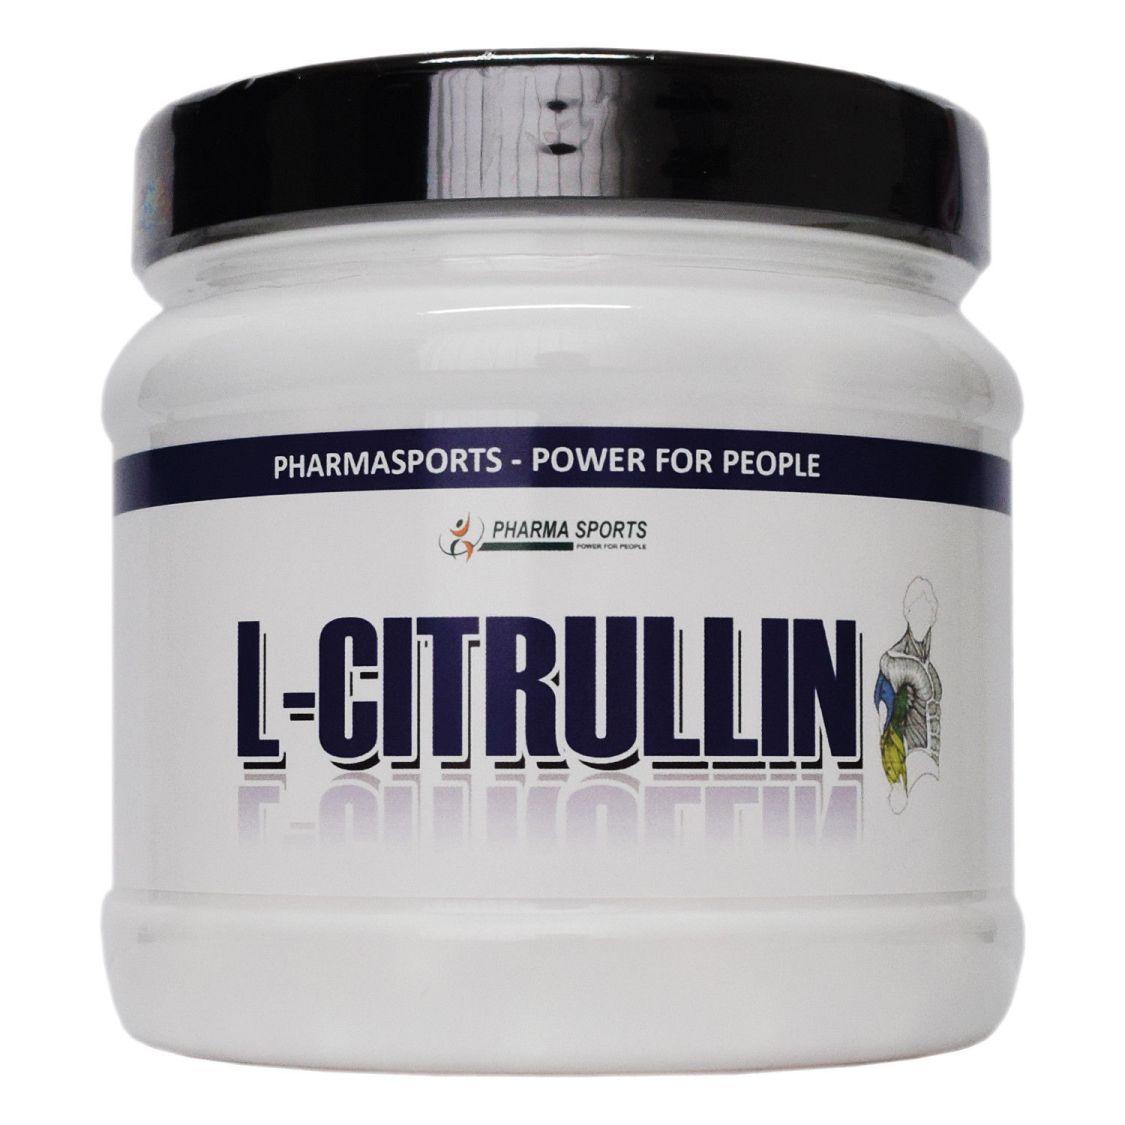 Pharmasports L-Citrullin Kapseln 240 Stück 1000 mg p. Kapsel 4000 mg pro Portion